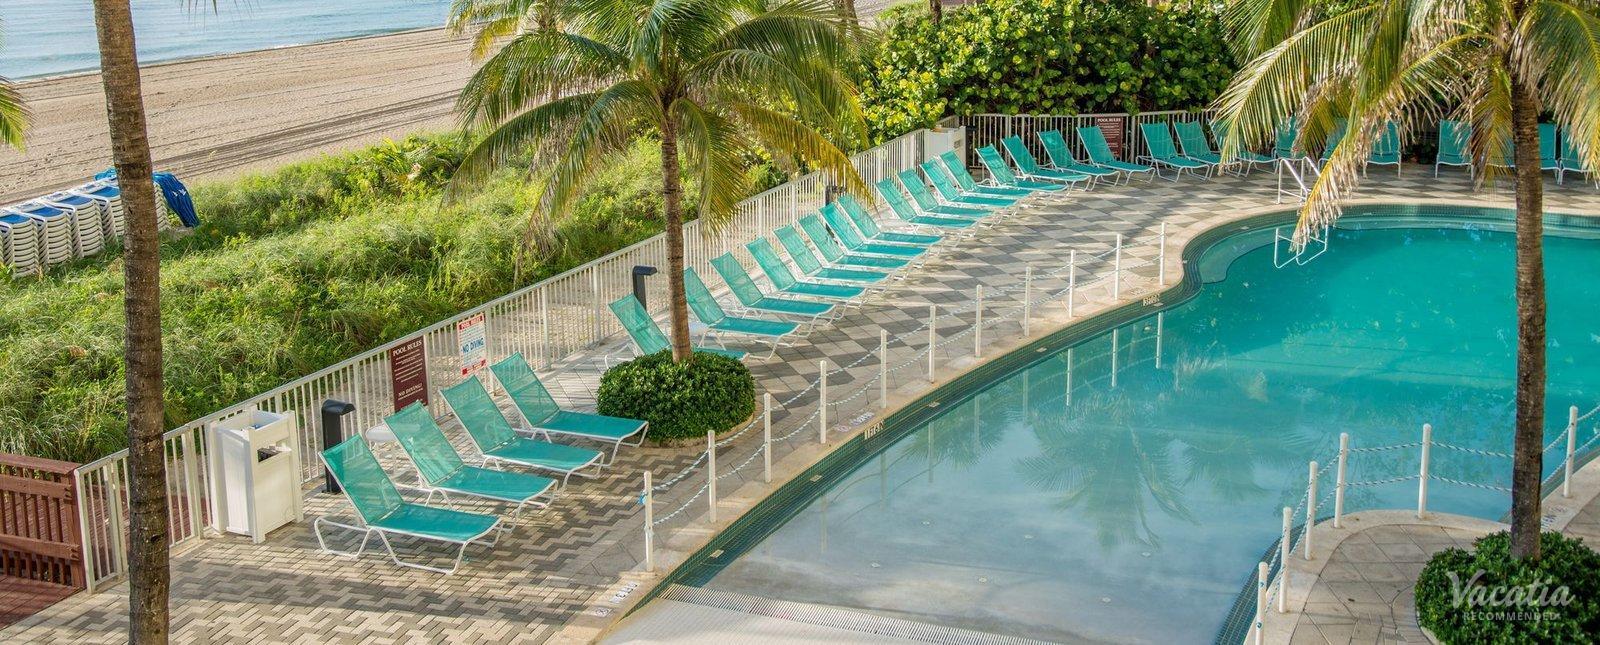 Doubletree Miami Beach - Miami Beach Resort & Spa | Vacatia